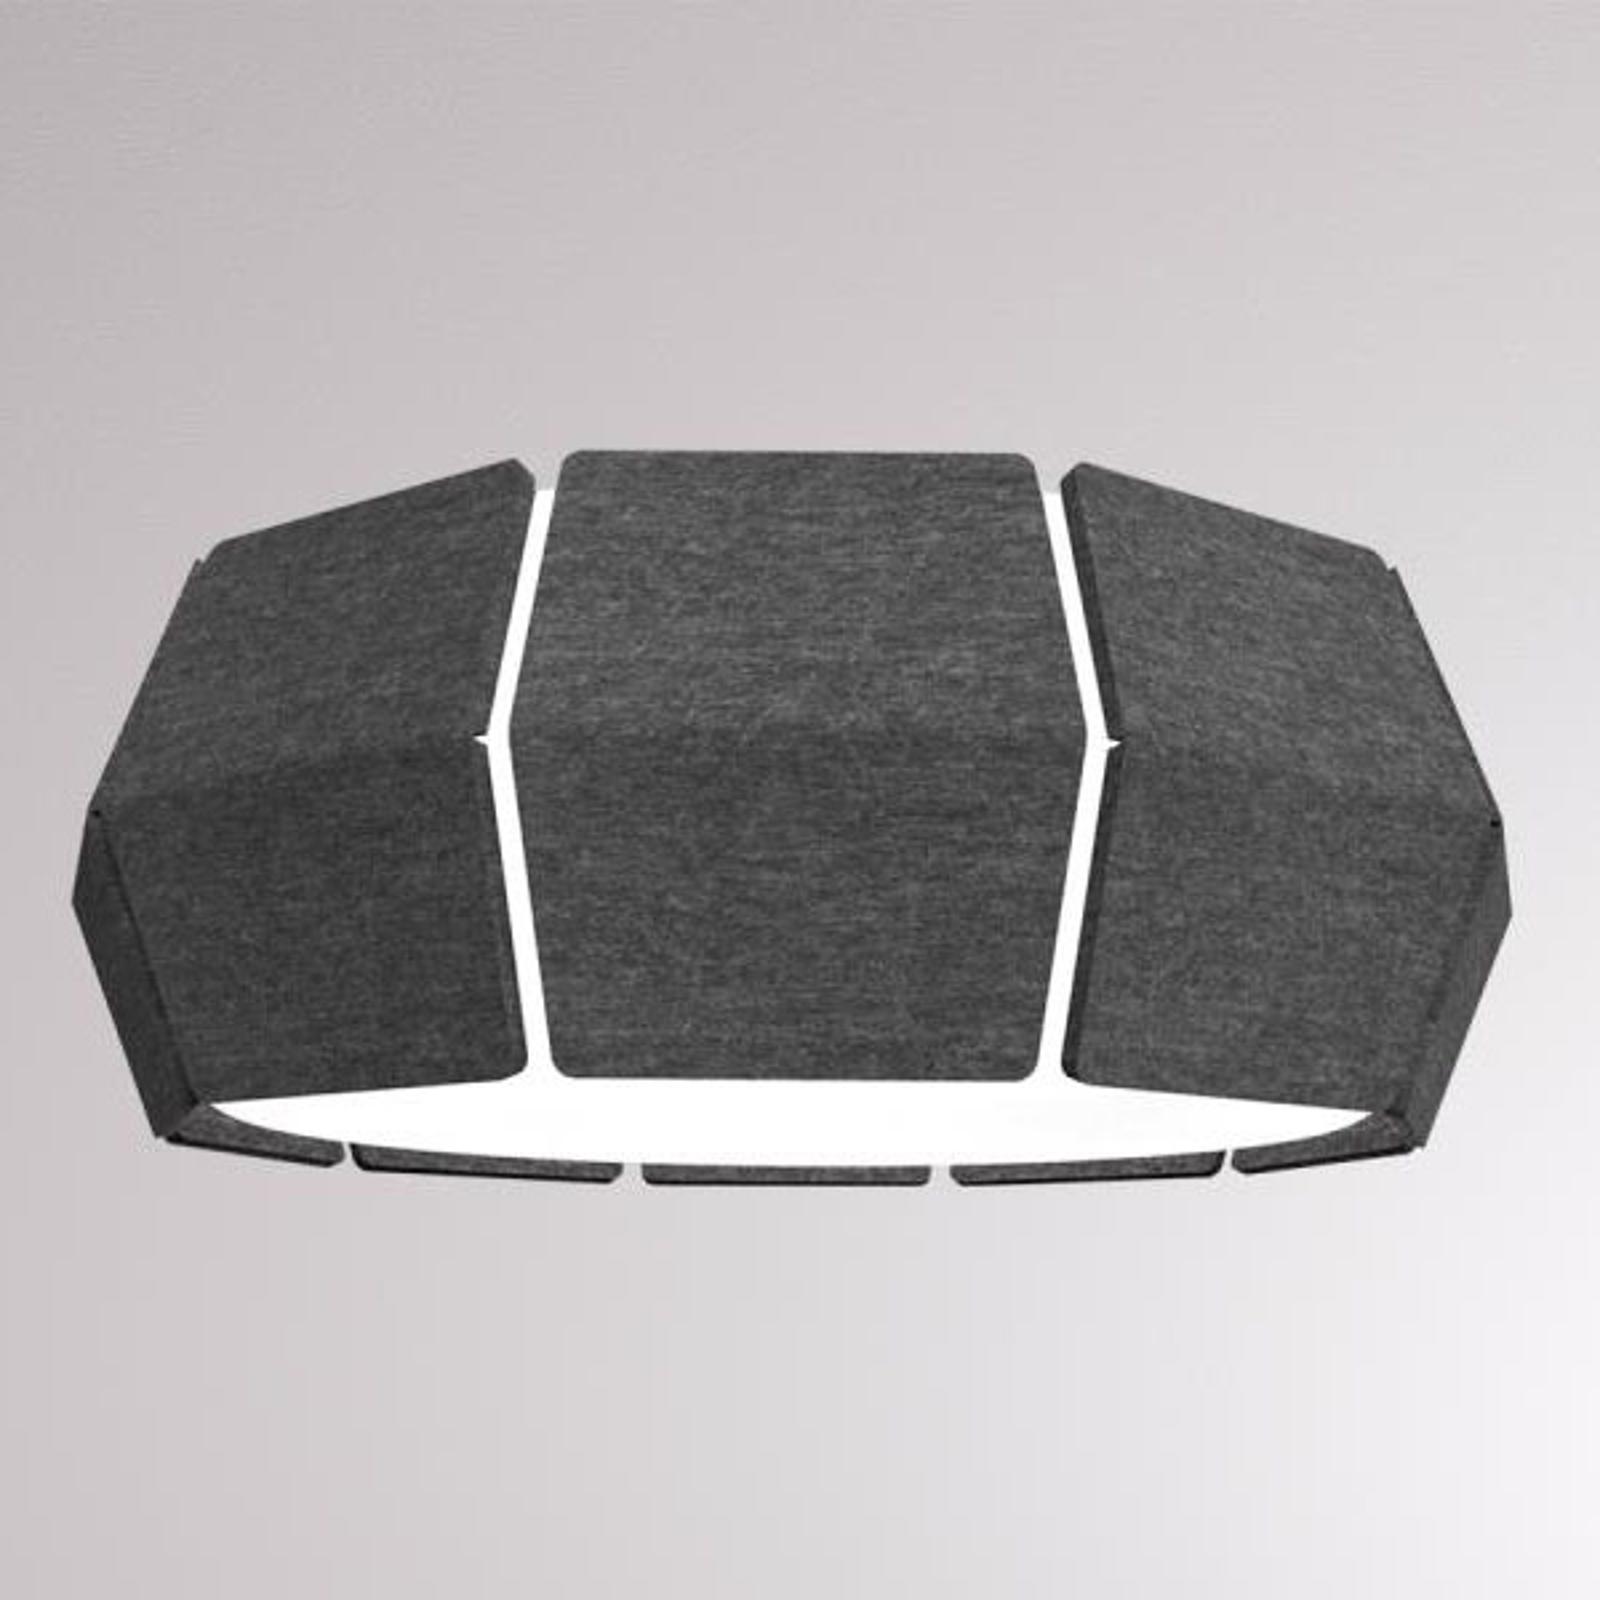 LOUM Decafelt -LED-kattovalaisin Ø 54 cm musta